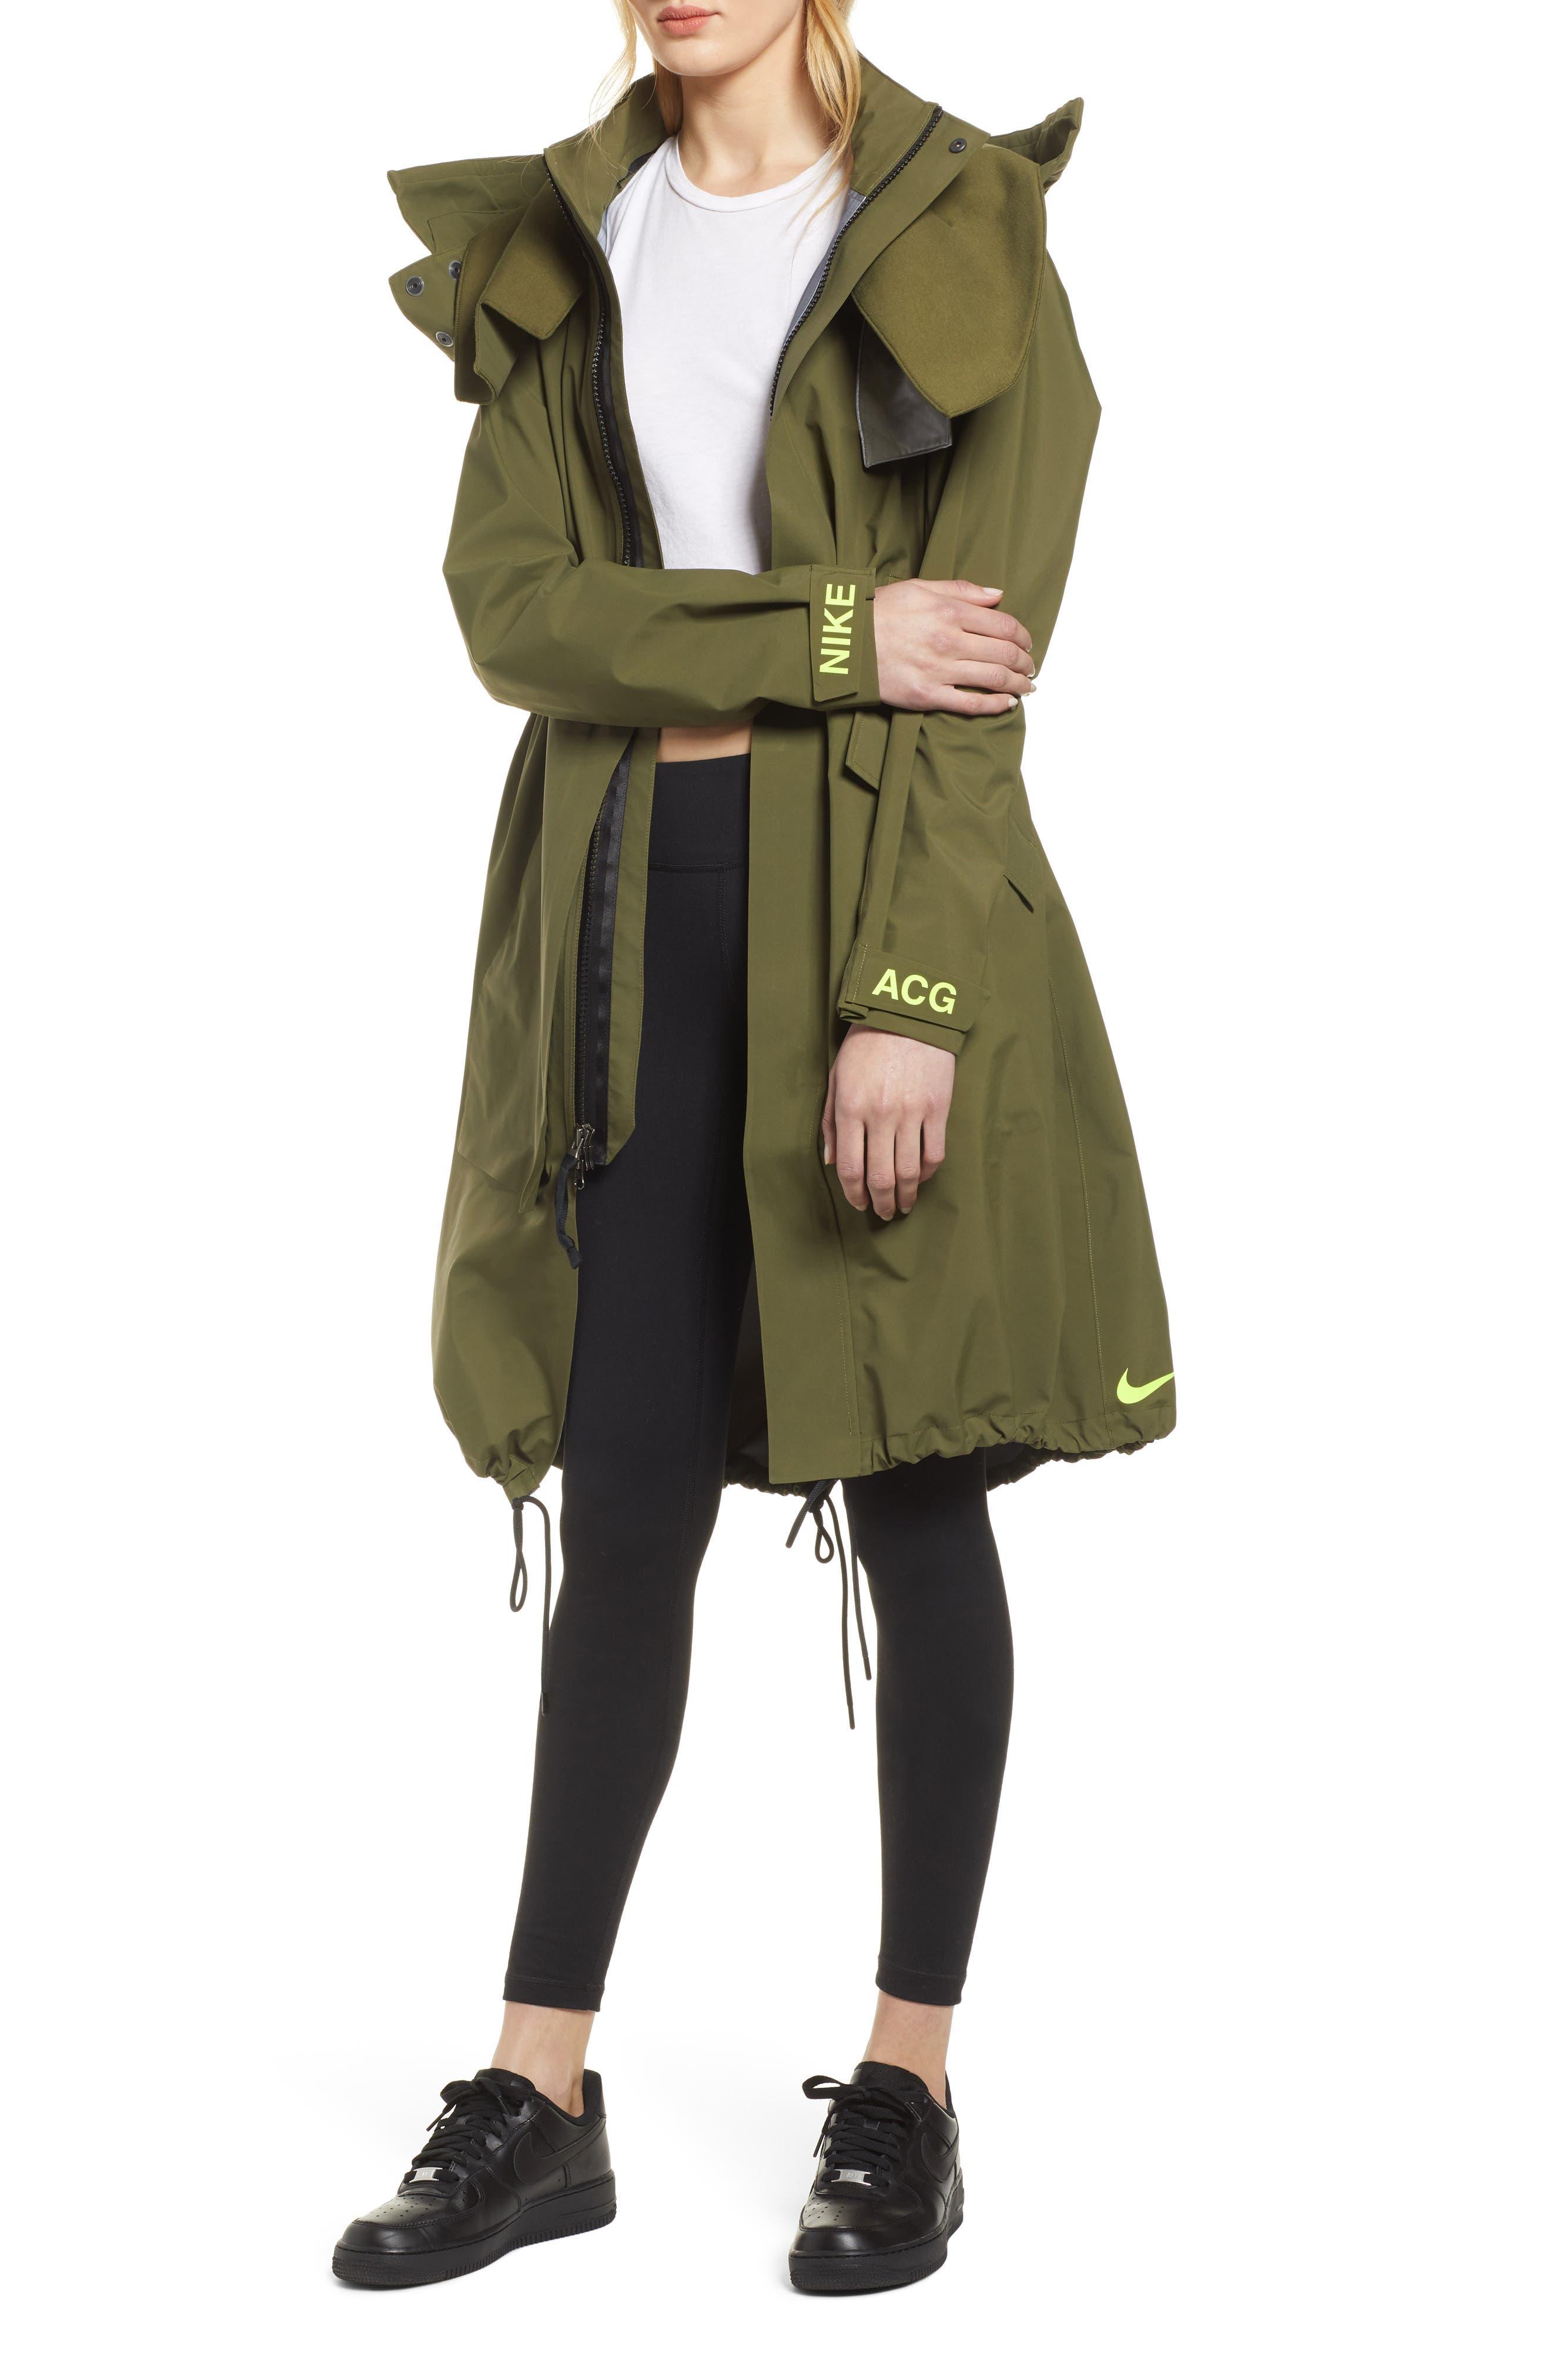 4bb090ac1eb5 Women s Nike Coats   Jackets